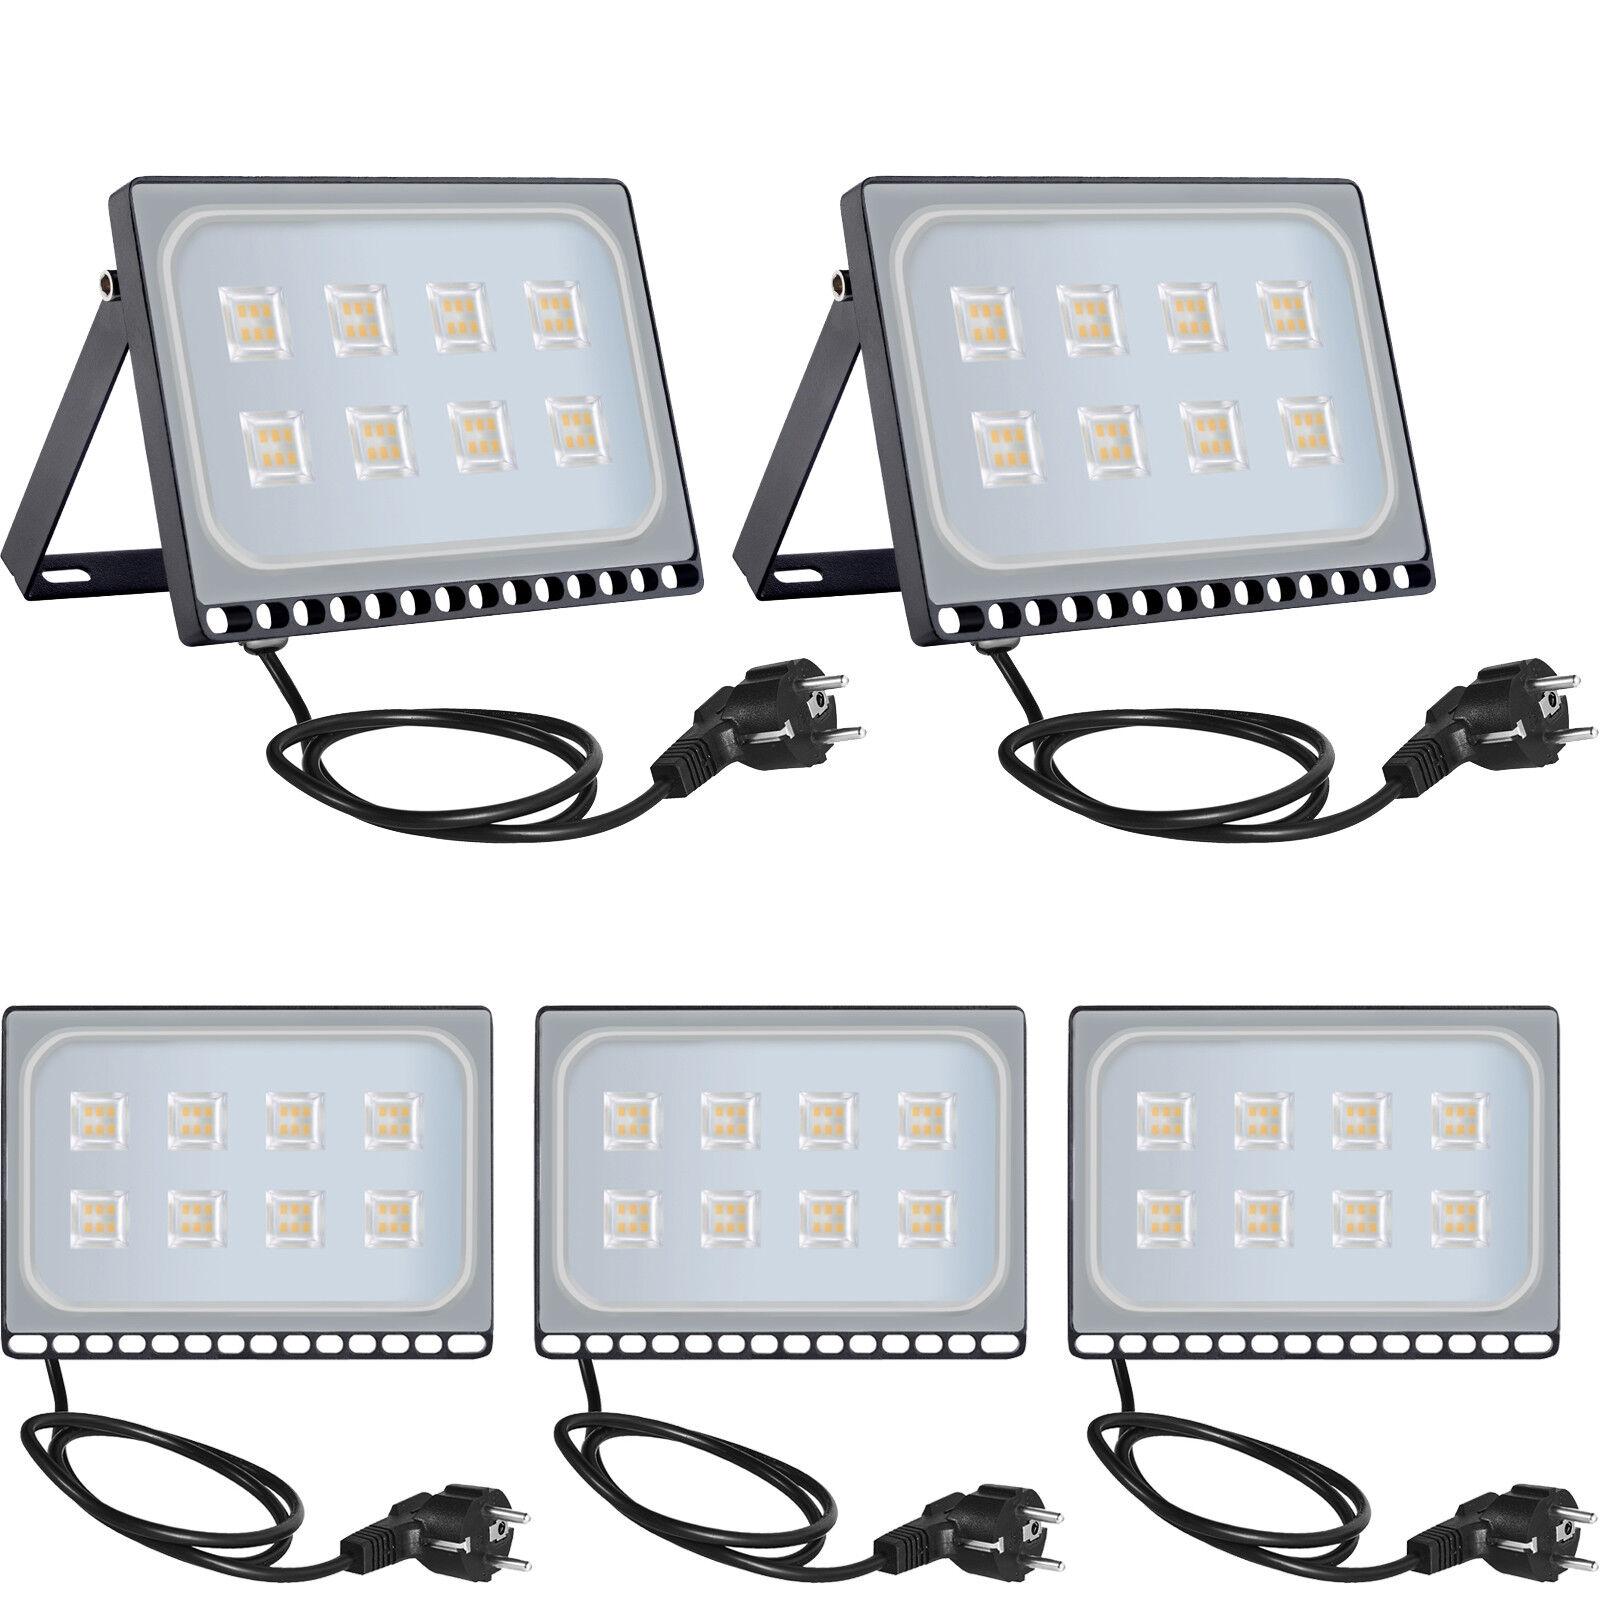 5x 50w LED eh con conector exterior reflector faros blancoo cálido ultra slim